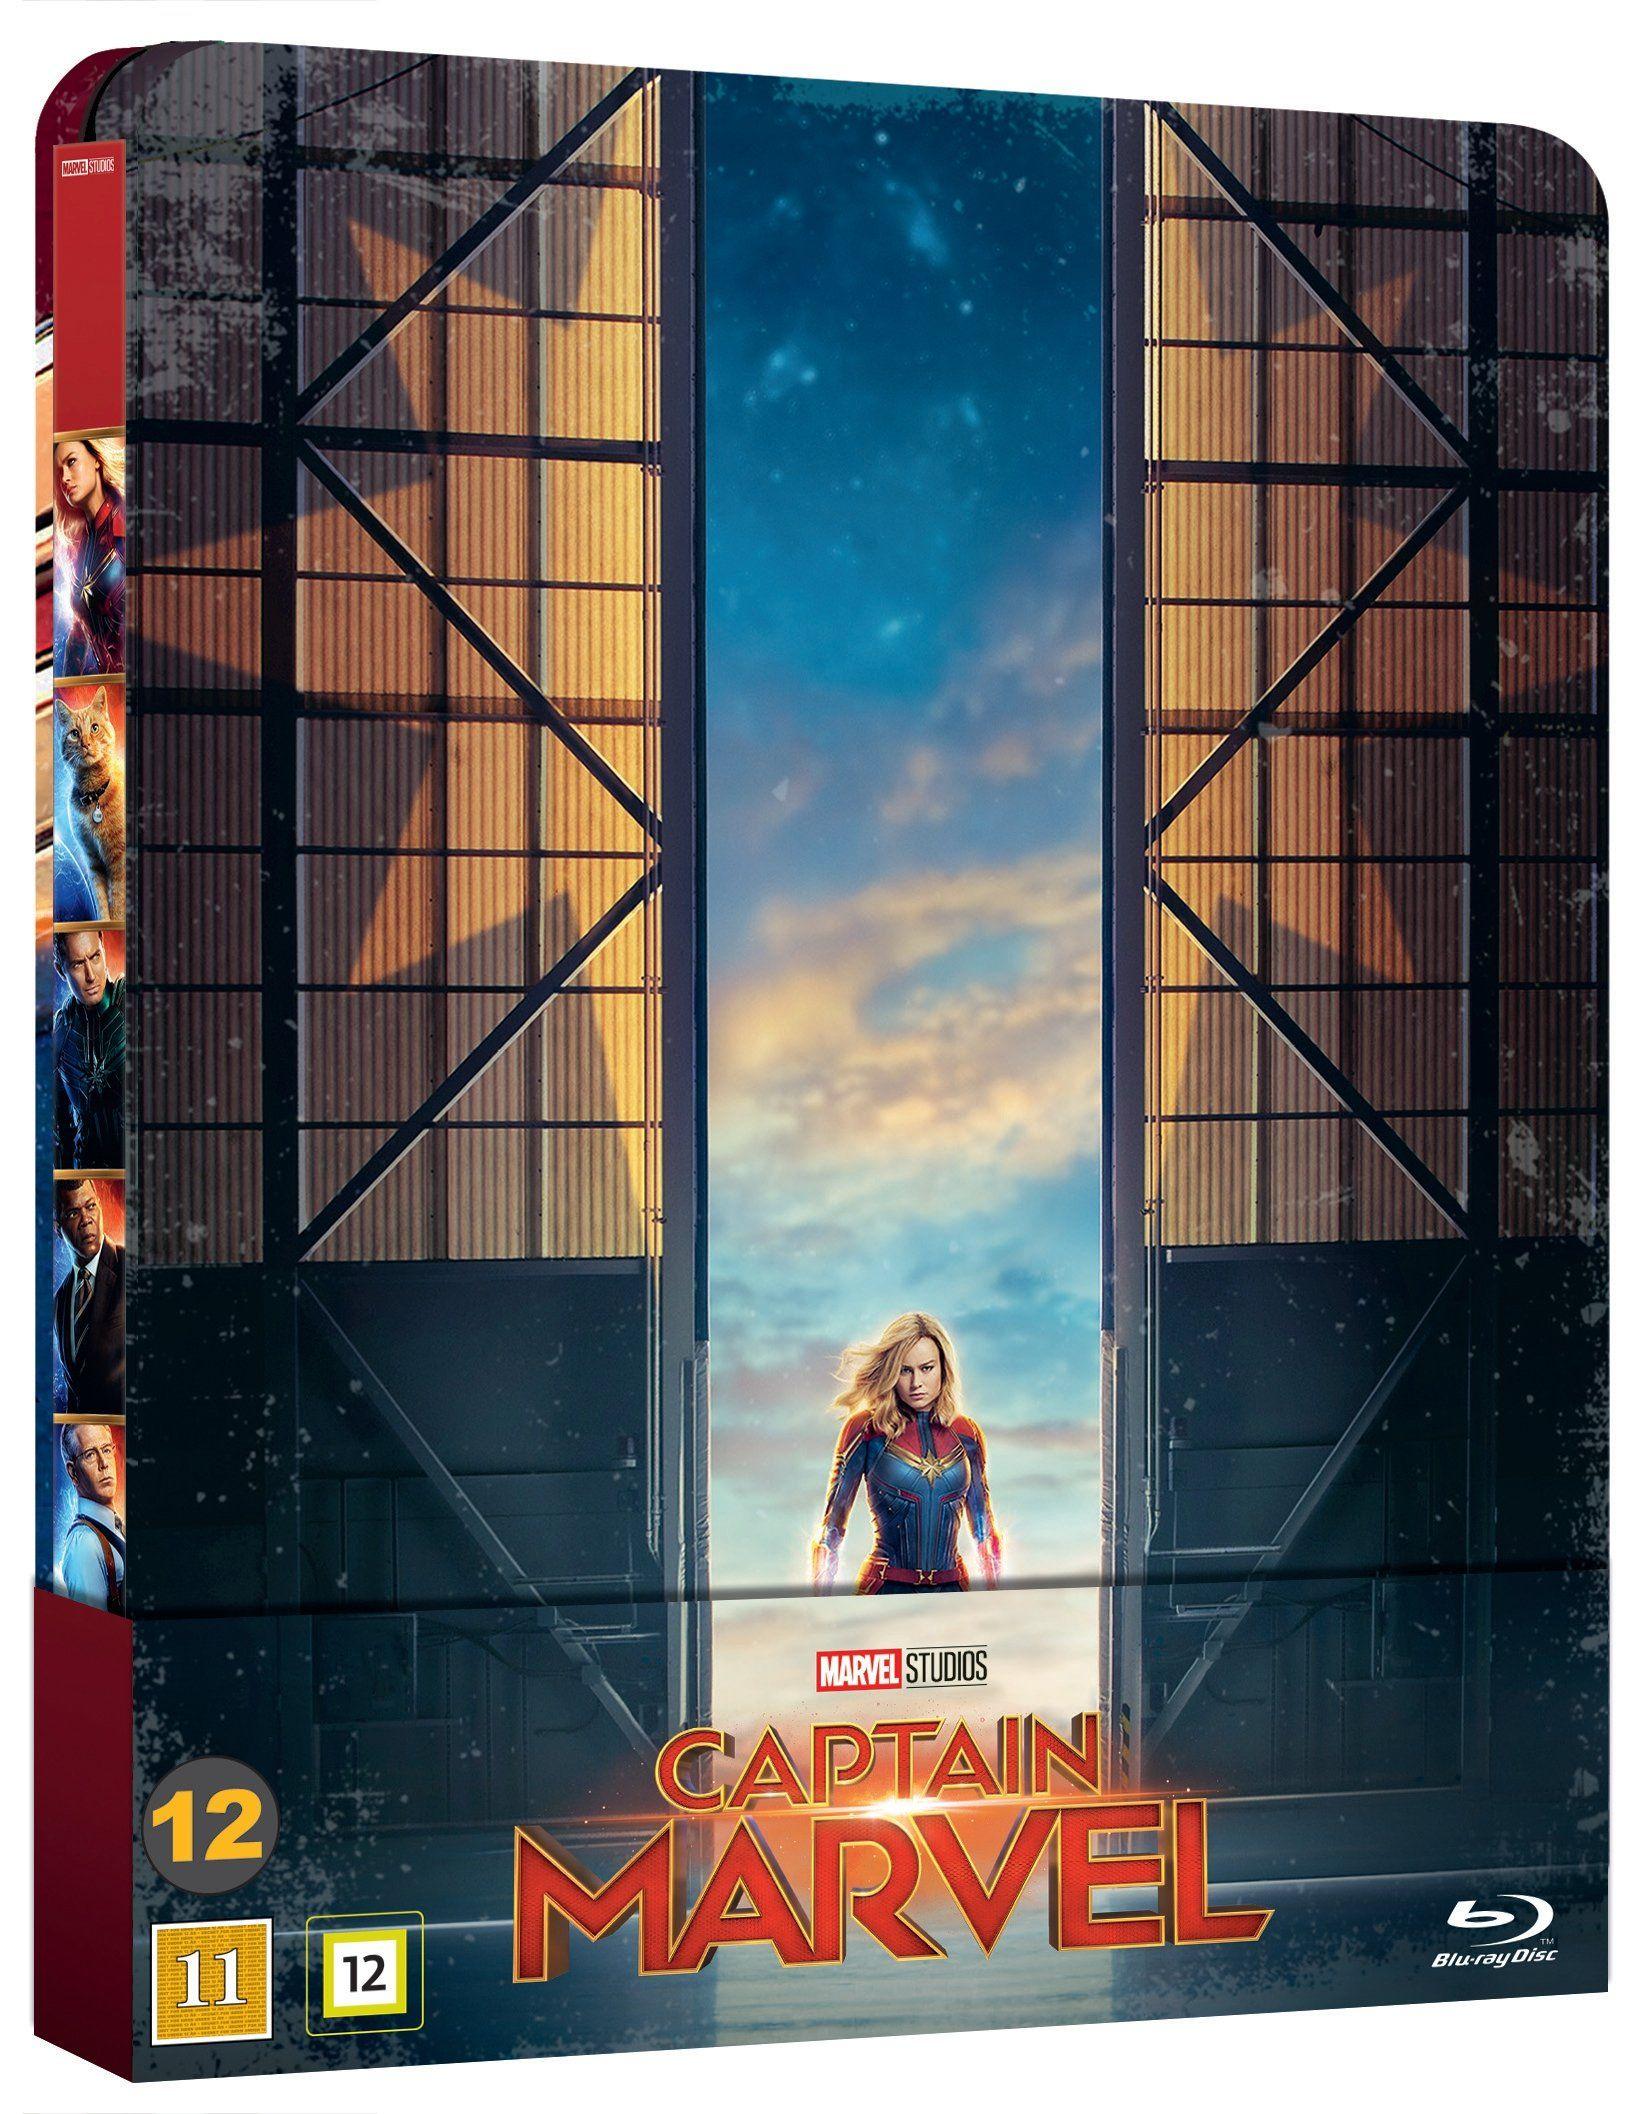 Captain Marvel - Bluray Steelbook [Danish Import] £10.06 @ Rarewares